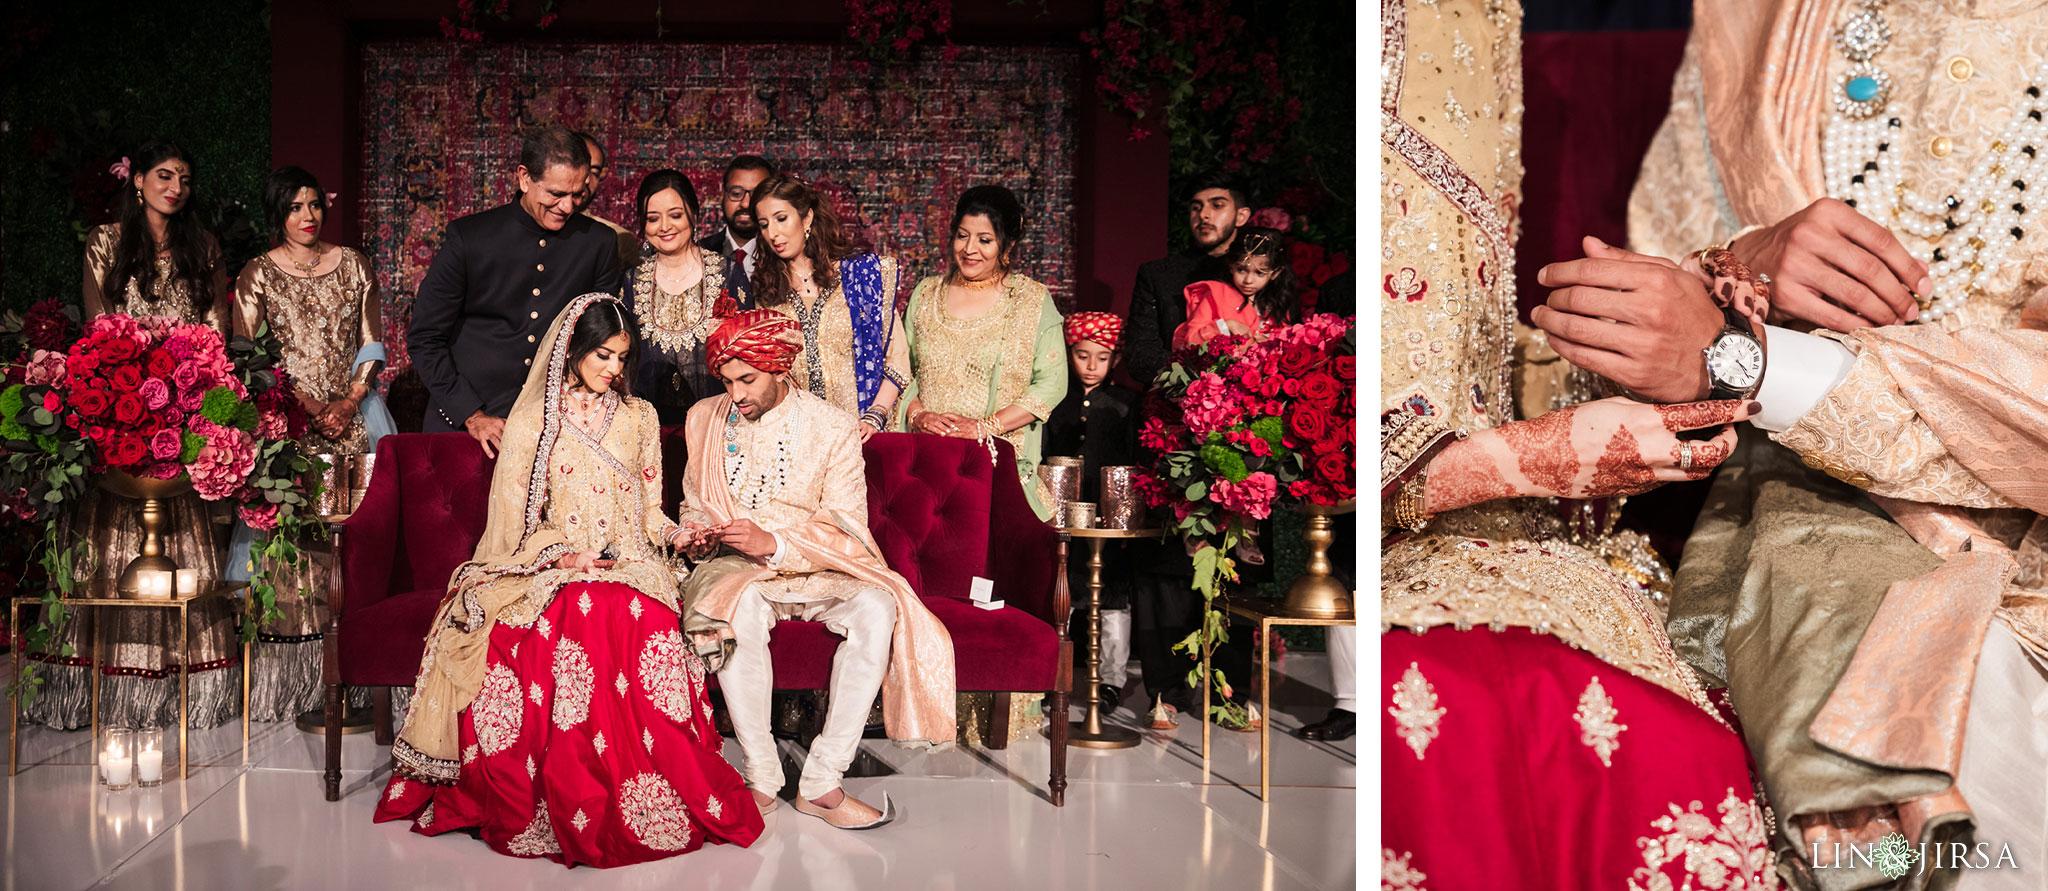 027 four seasons westlake village muslim wedding photography